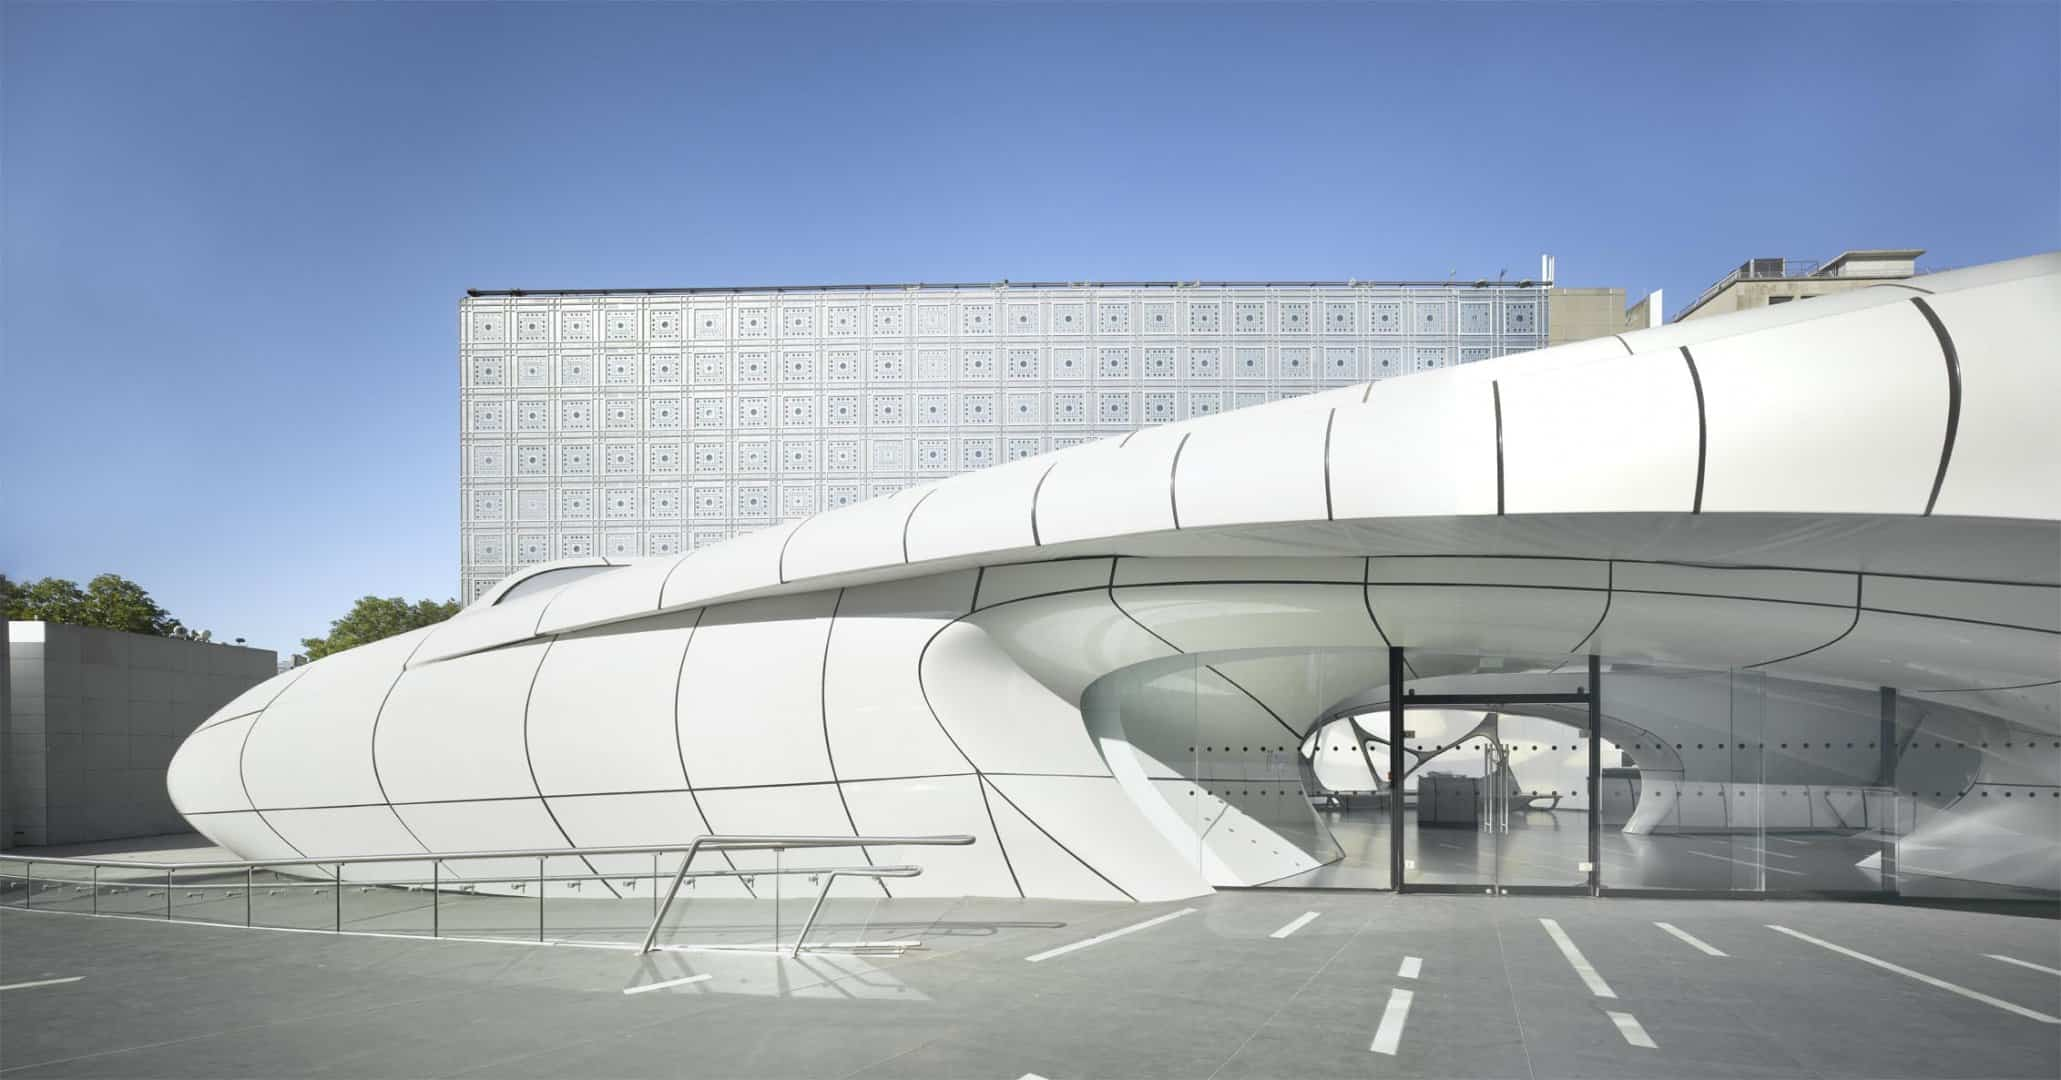 Zaha Hadid Design - Mobile Art Chanel Pavilion - rolandhalbe_paris2